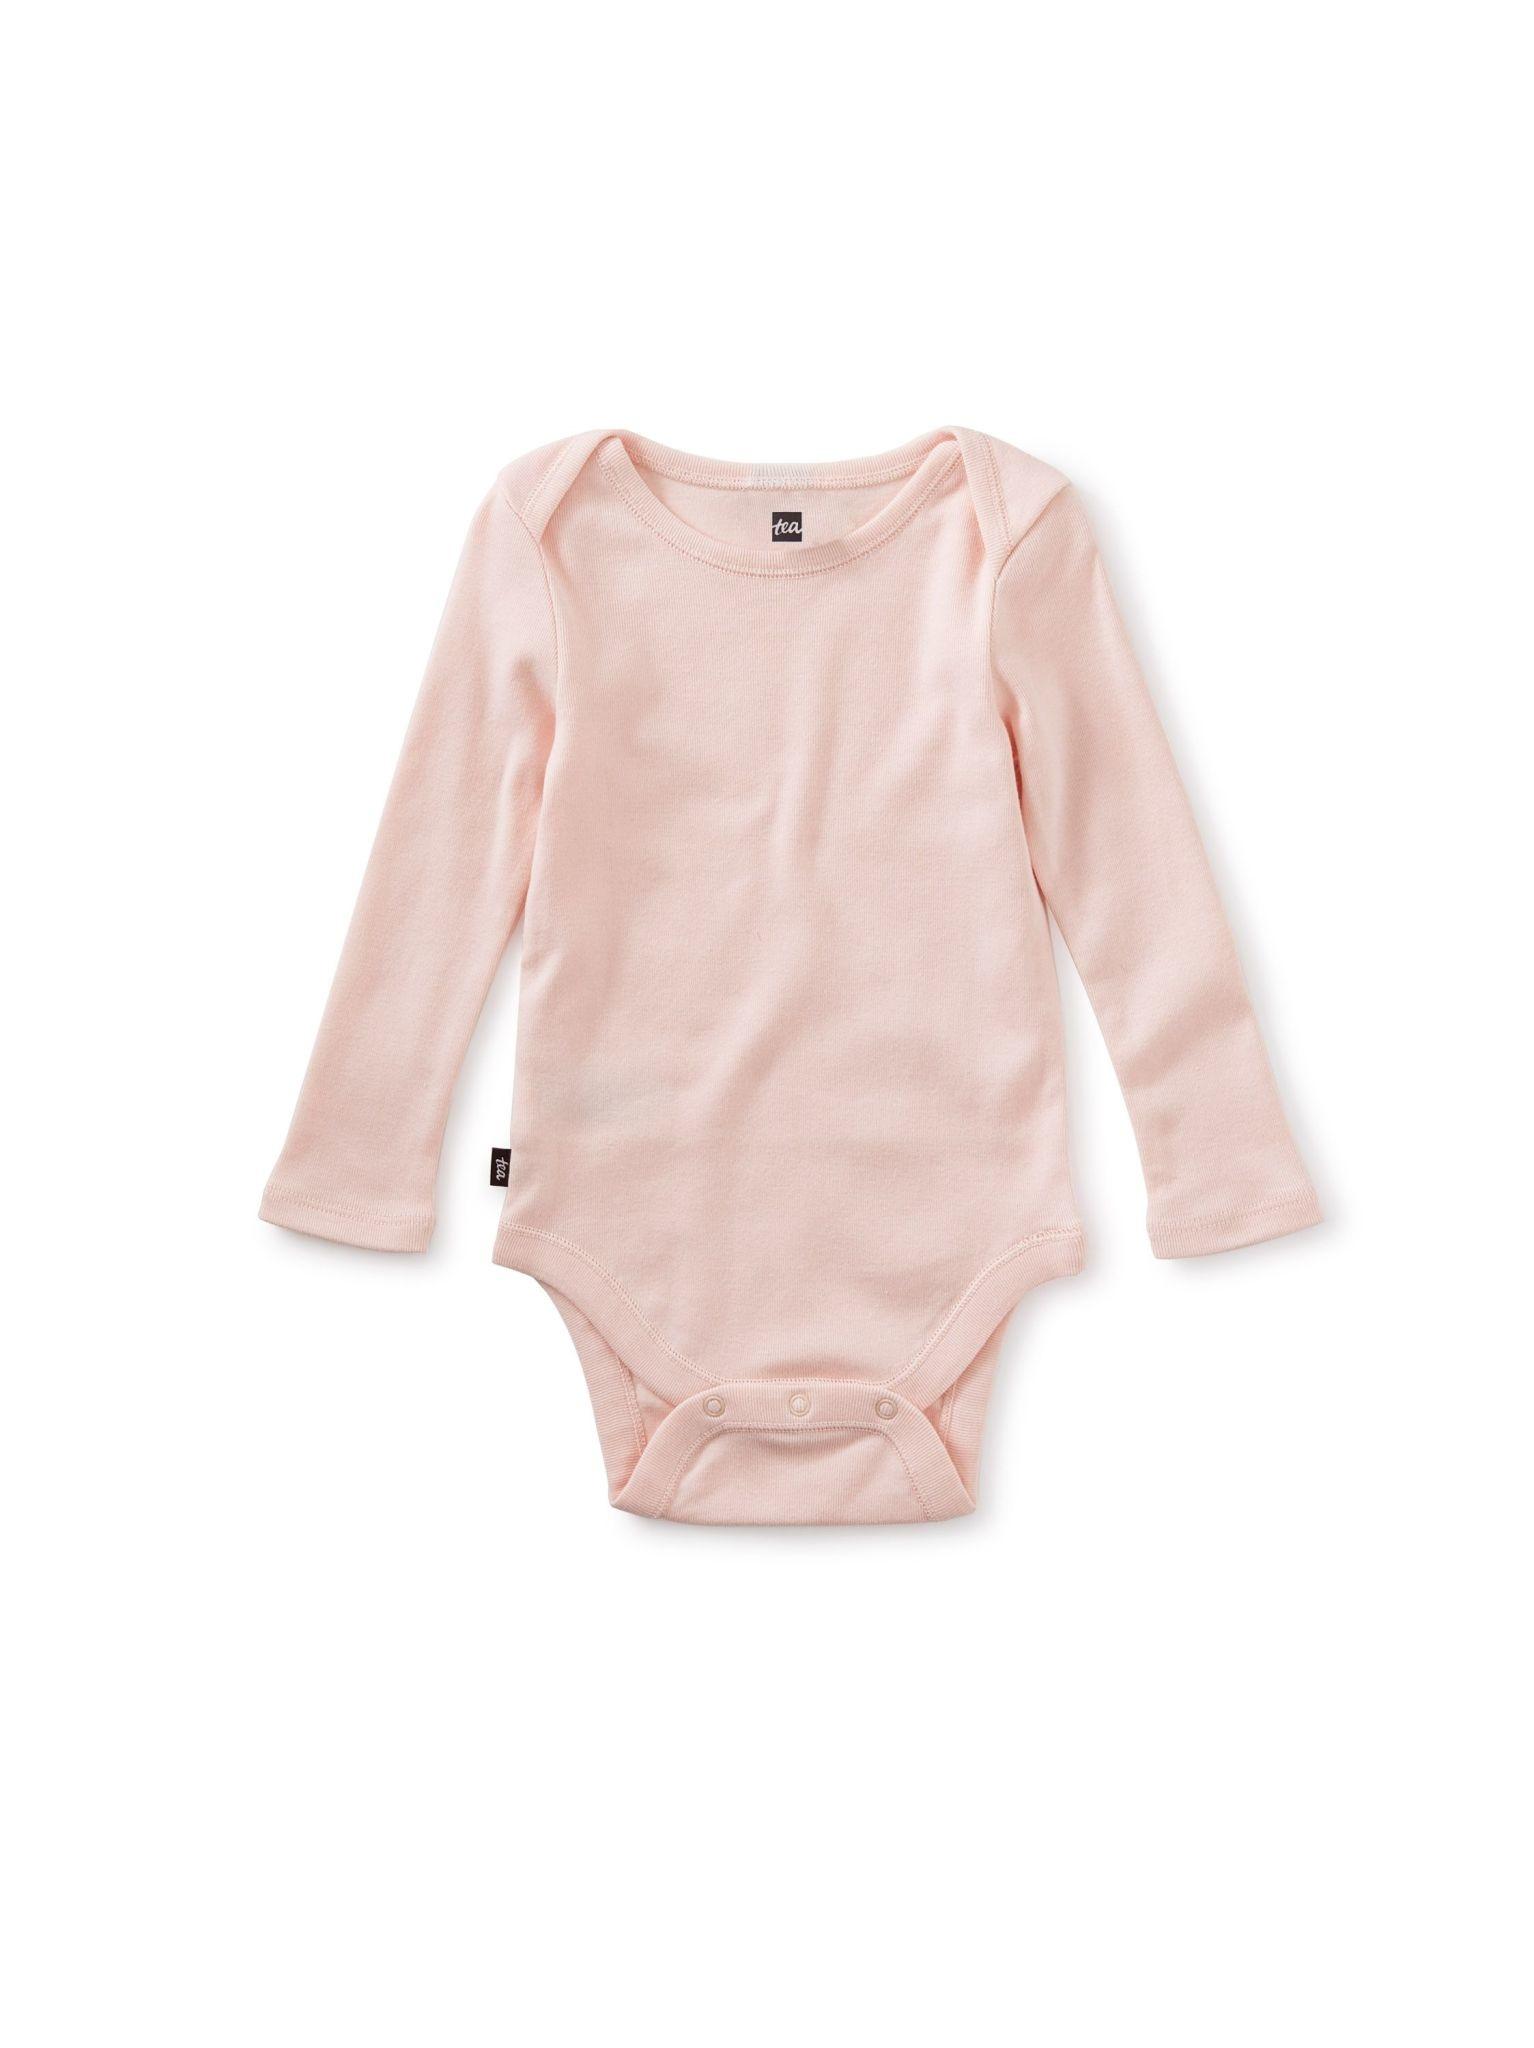 Tea Collection Baby Bodysuit - Pink Salt